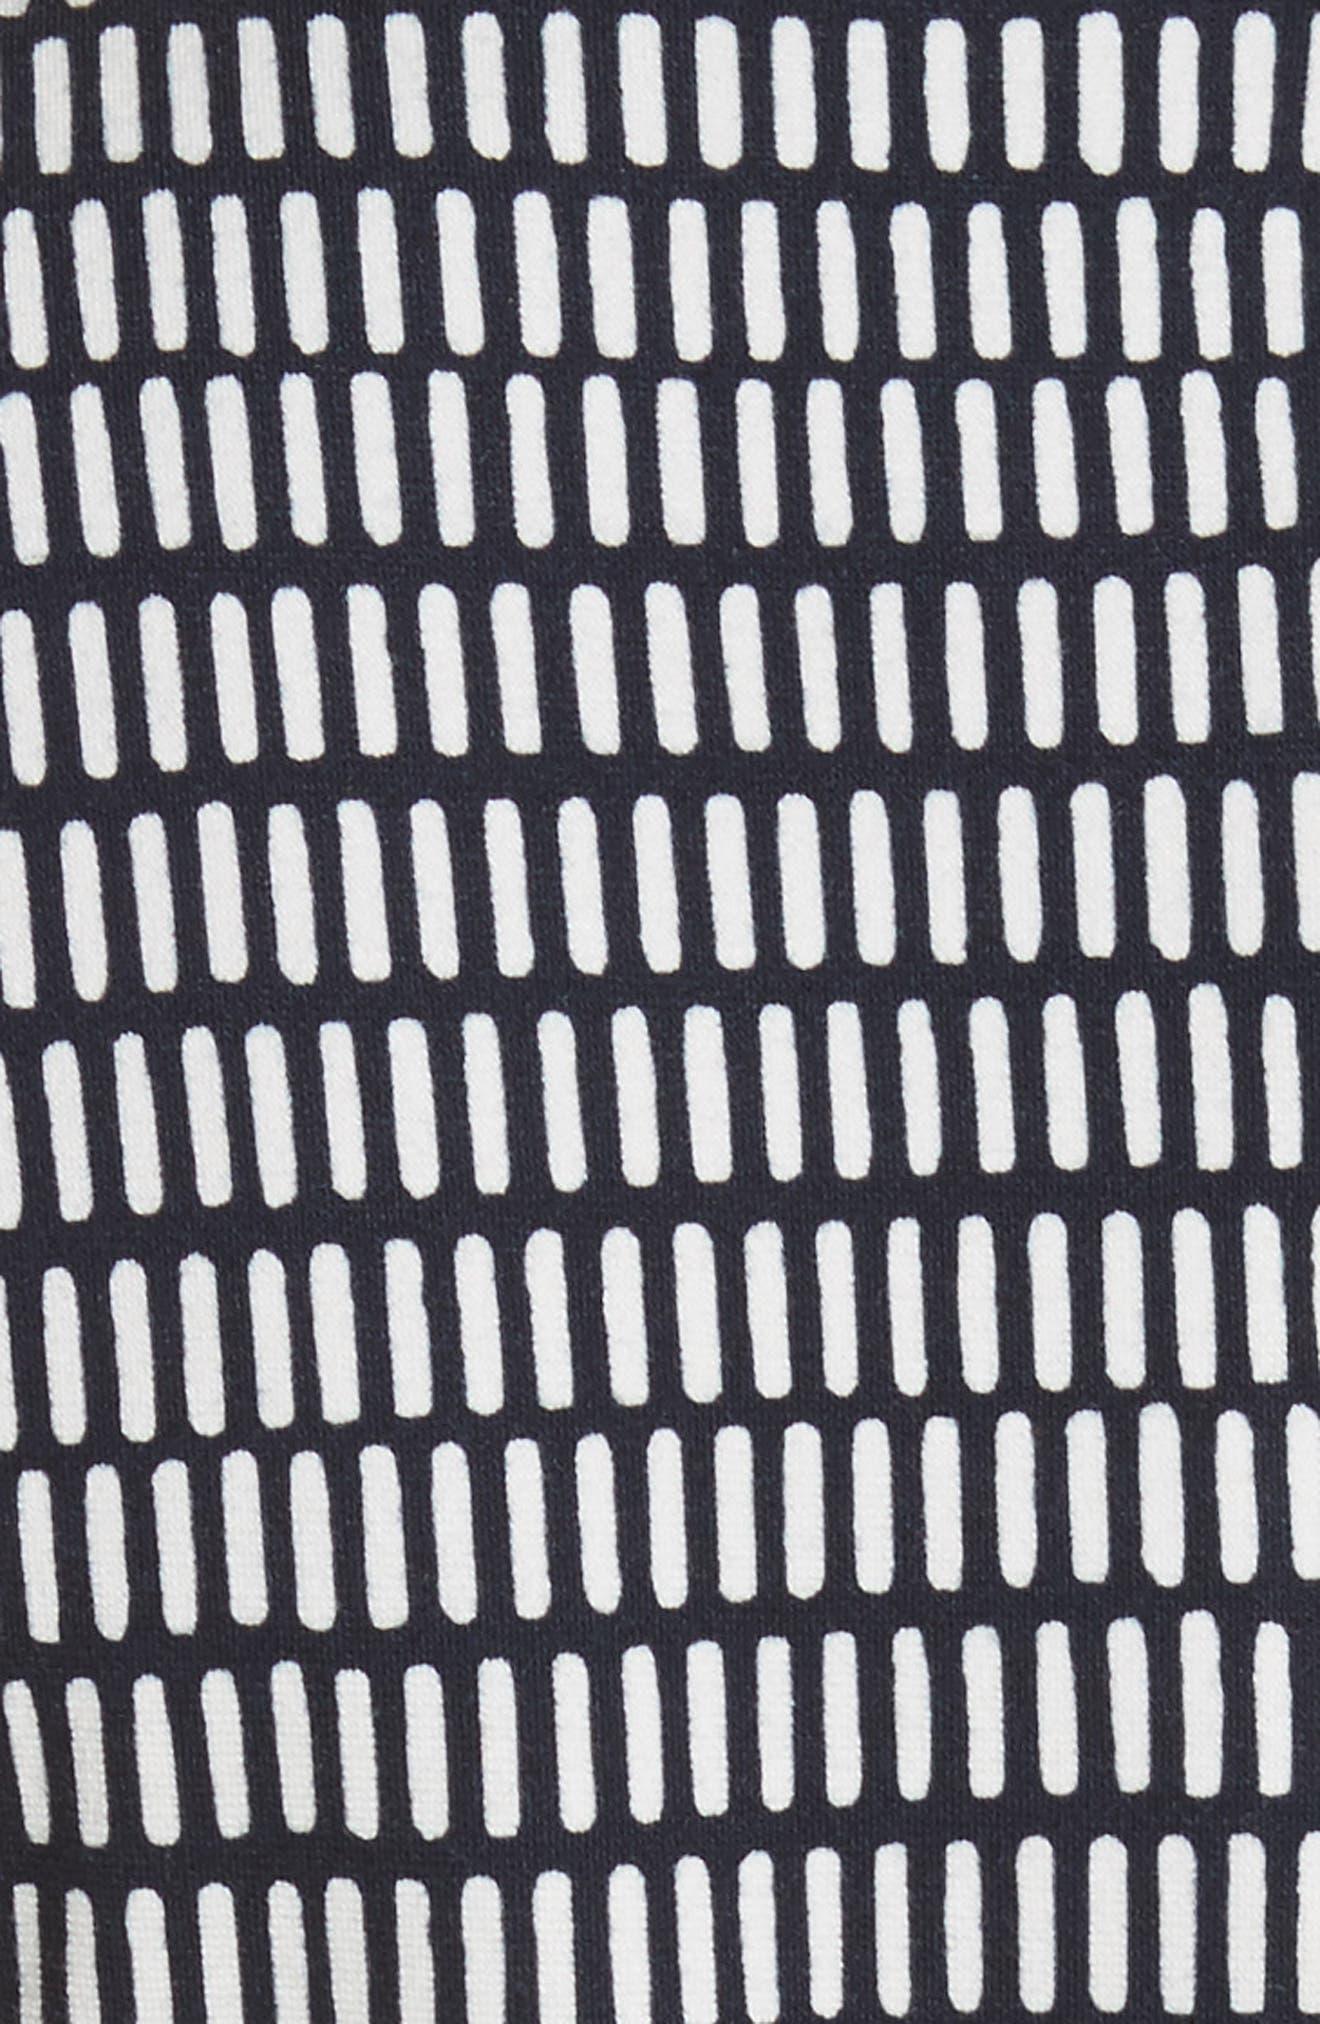 Felino Print Sheath Dress,                             Alternate thumbnail 5, color,                             Cornflower Blue